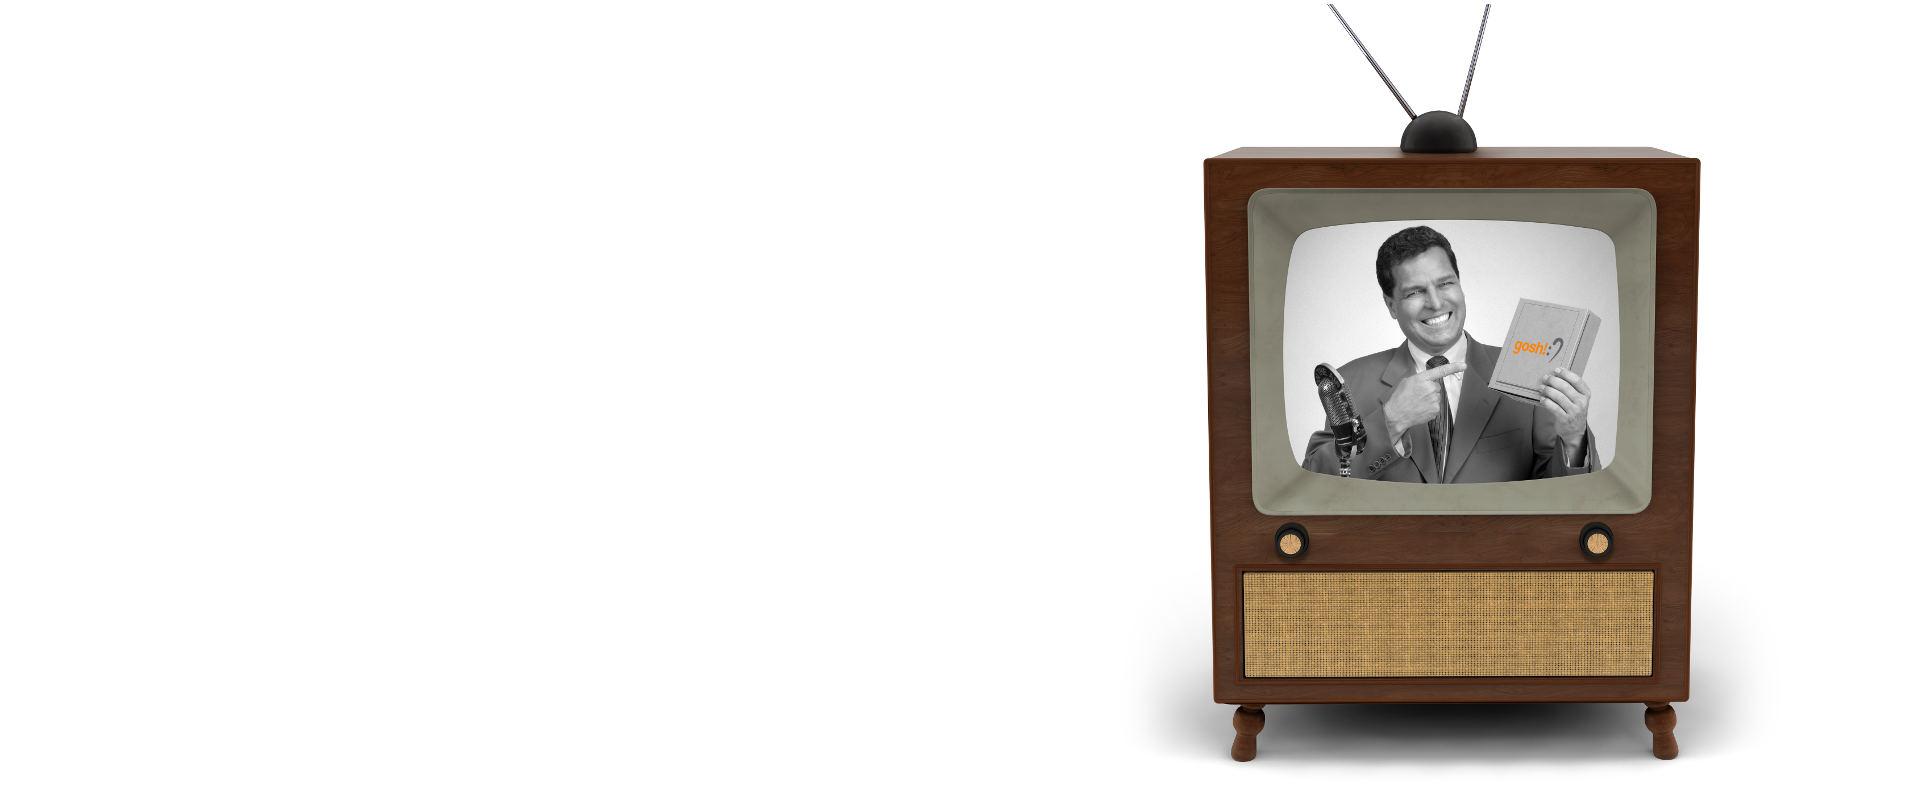 gosh tv